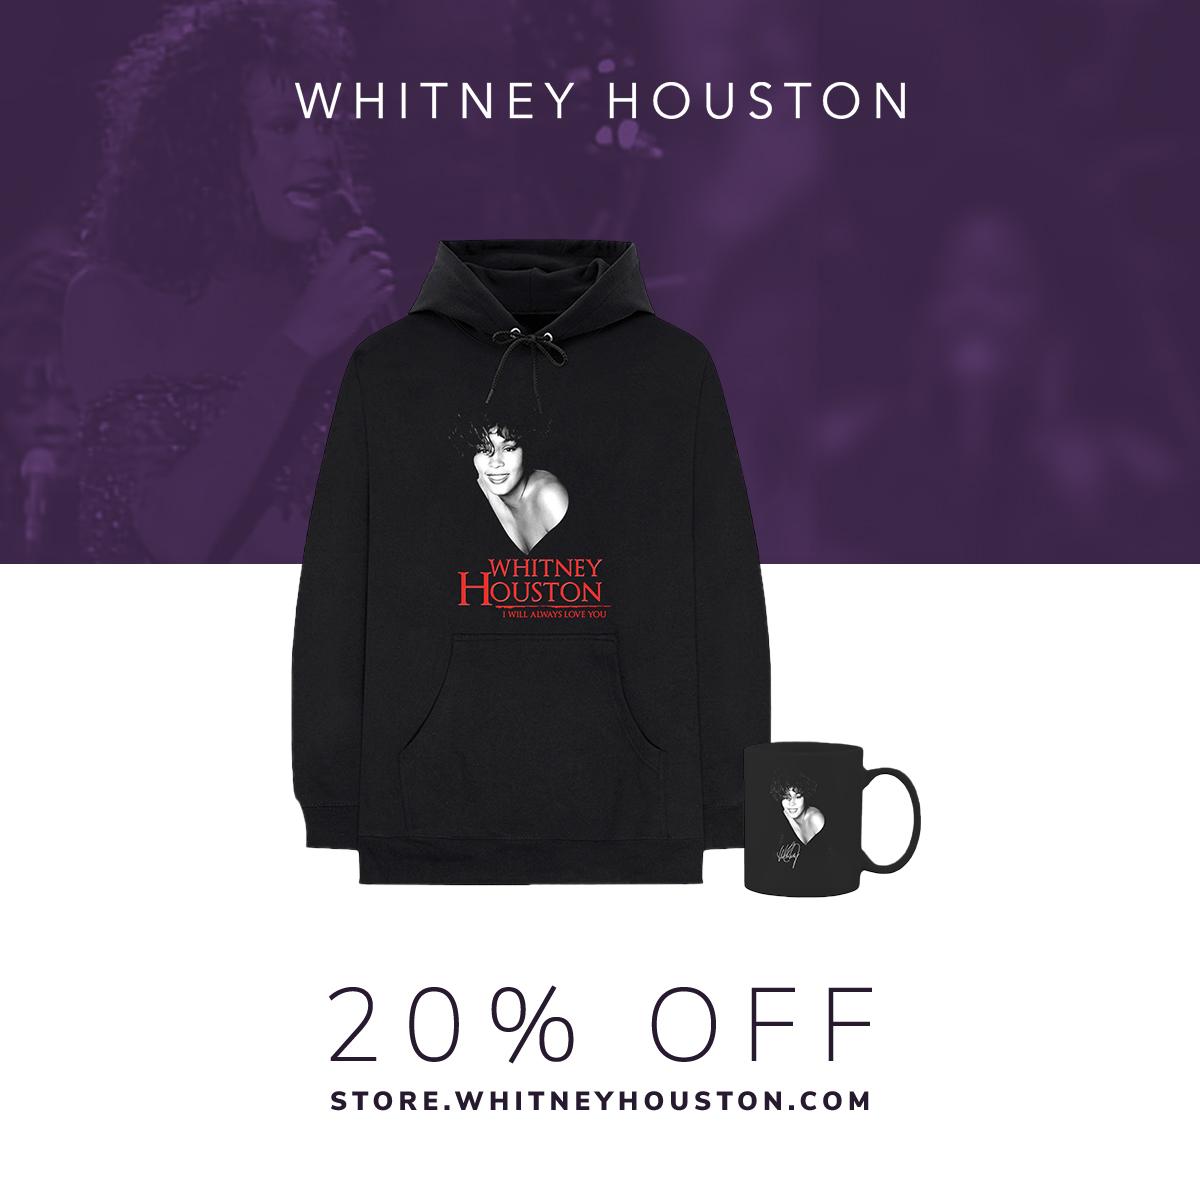 Whitney Houston merchandise Black Friday sale